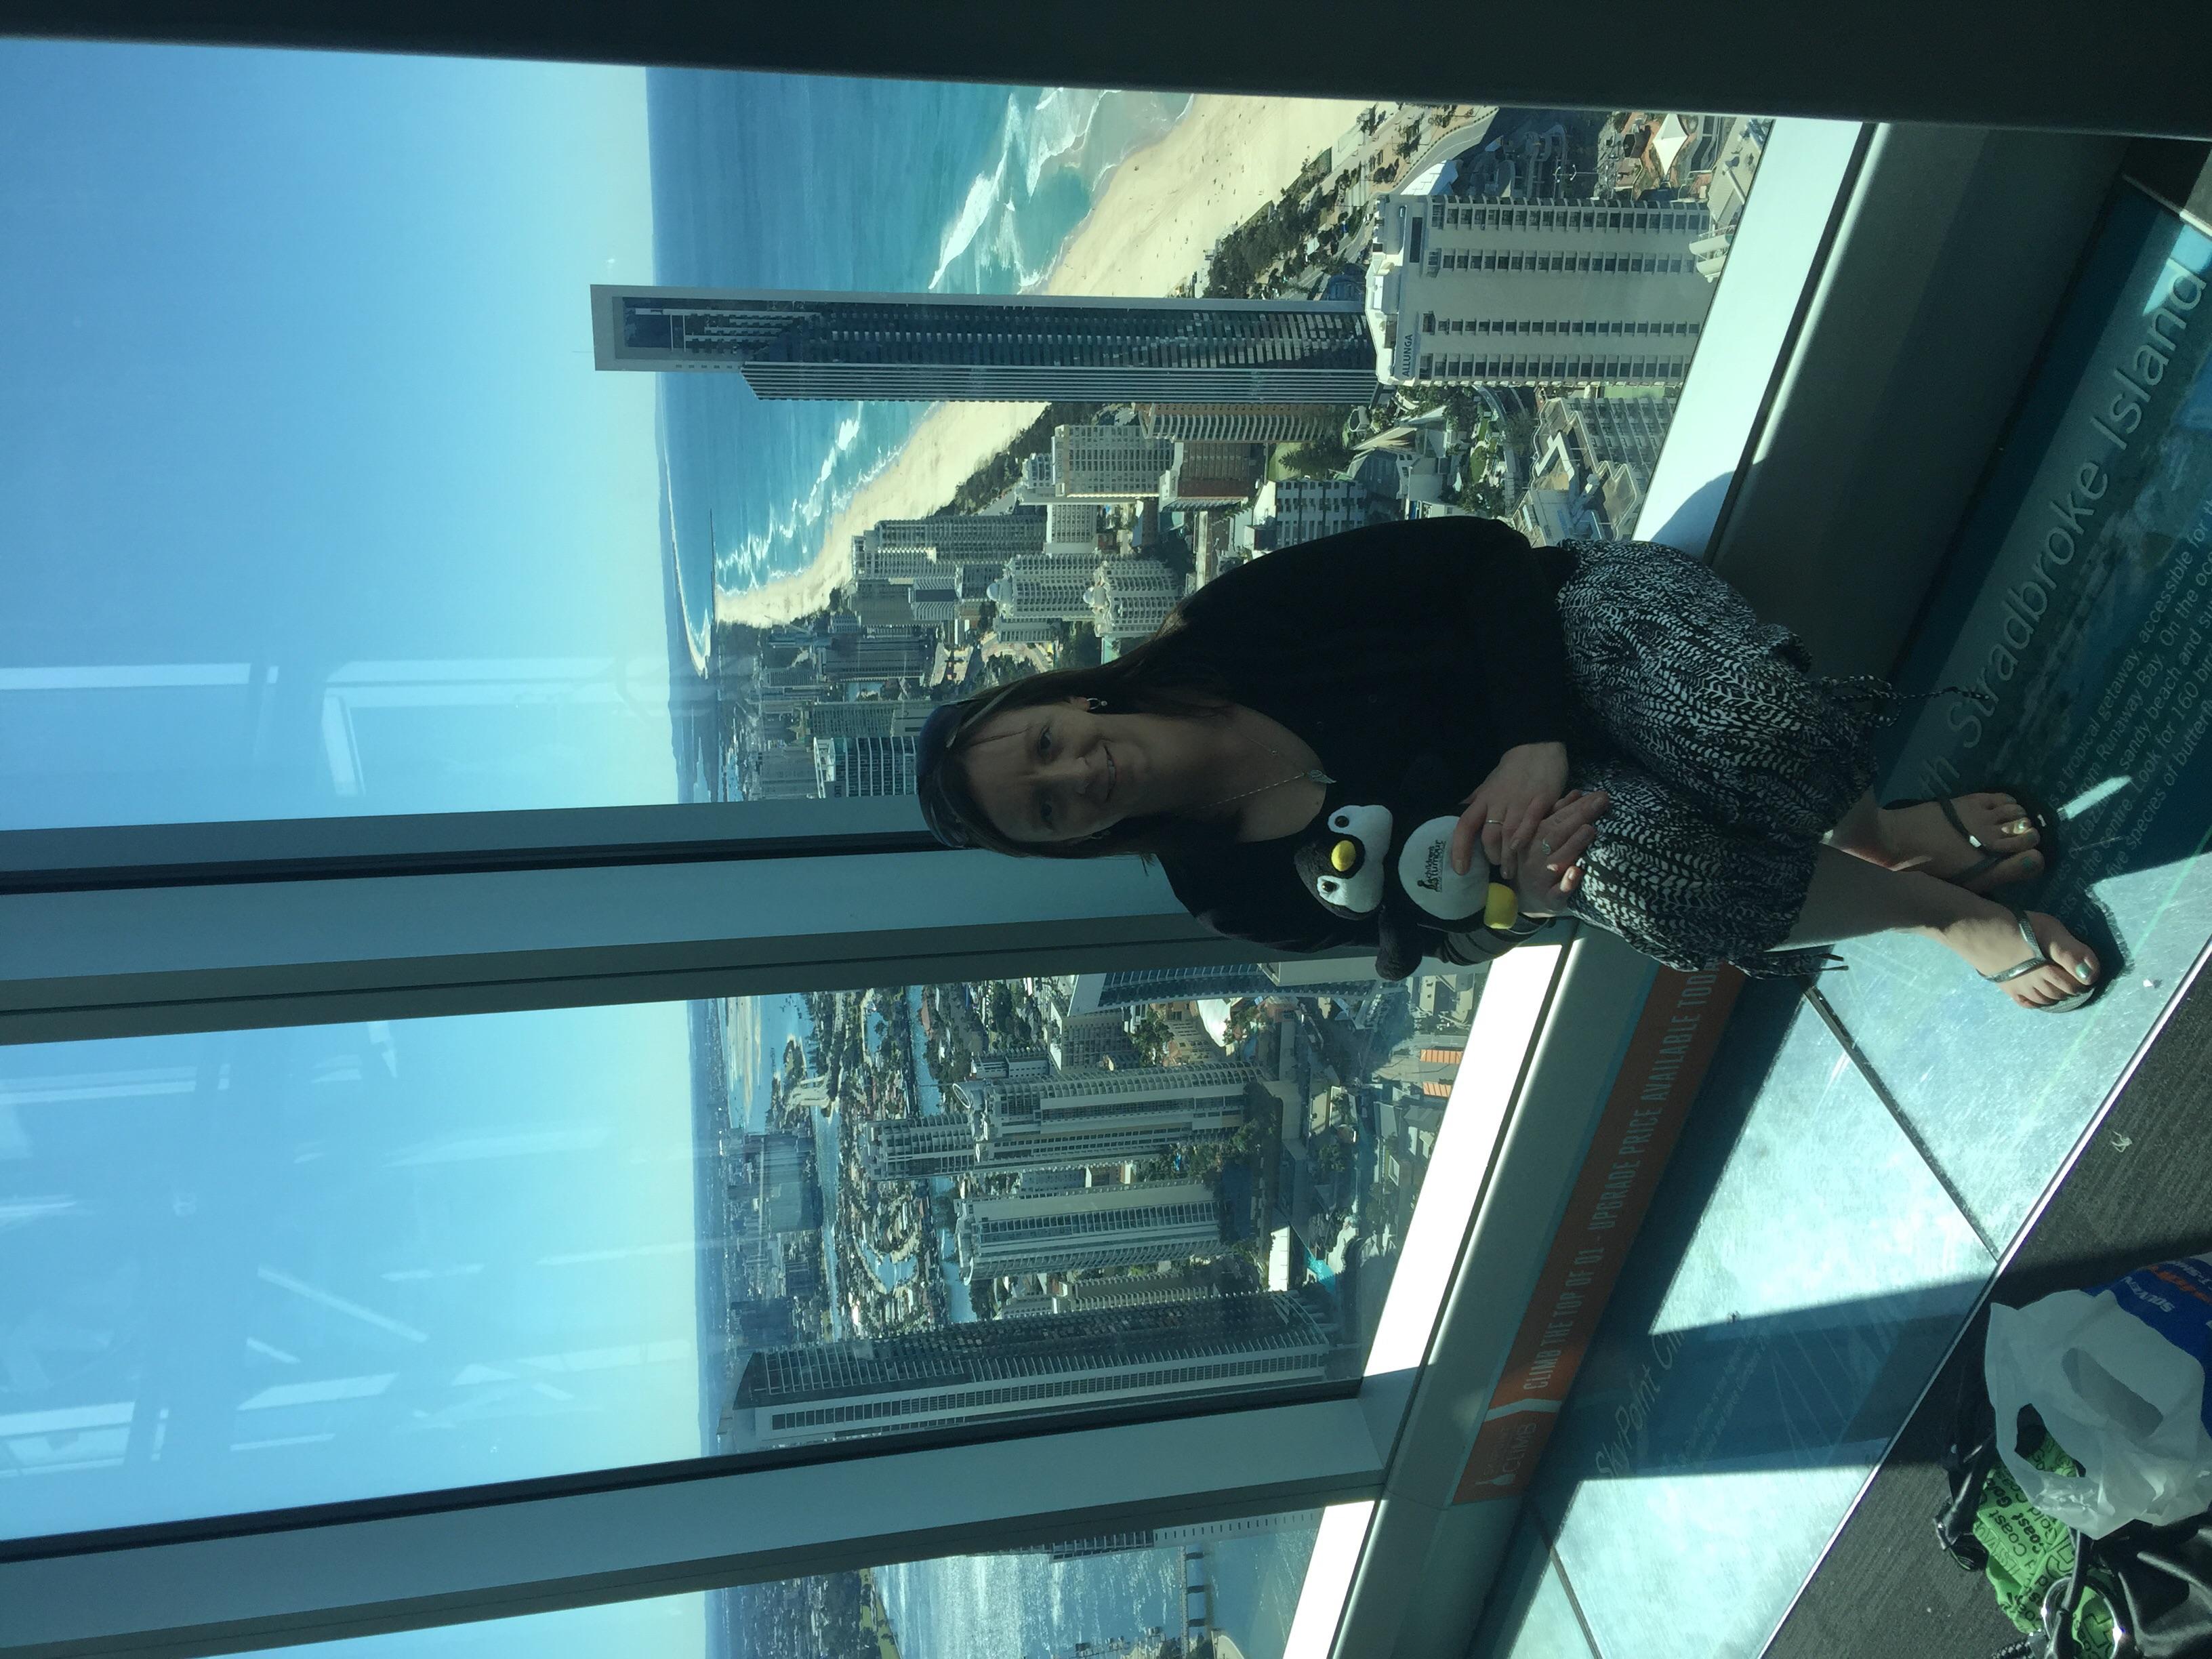 Skypoint-Surfers Paradise-77th floor-amazing views.